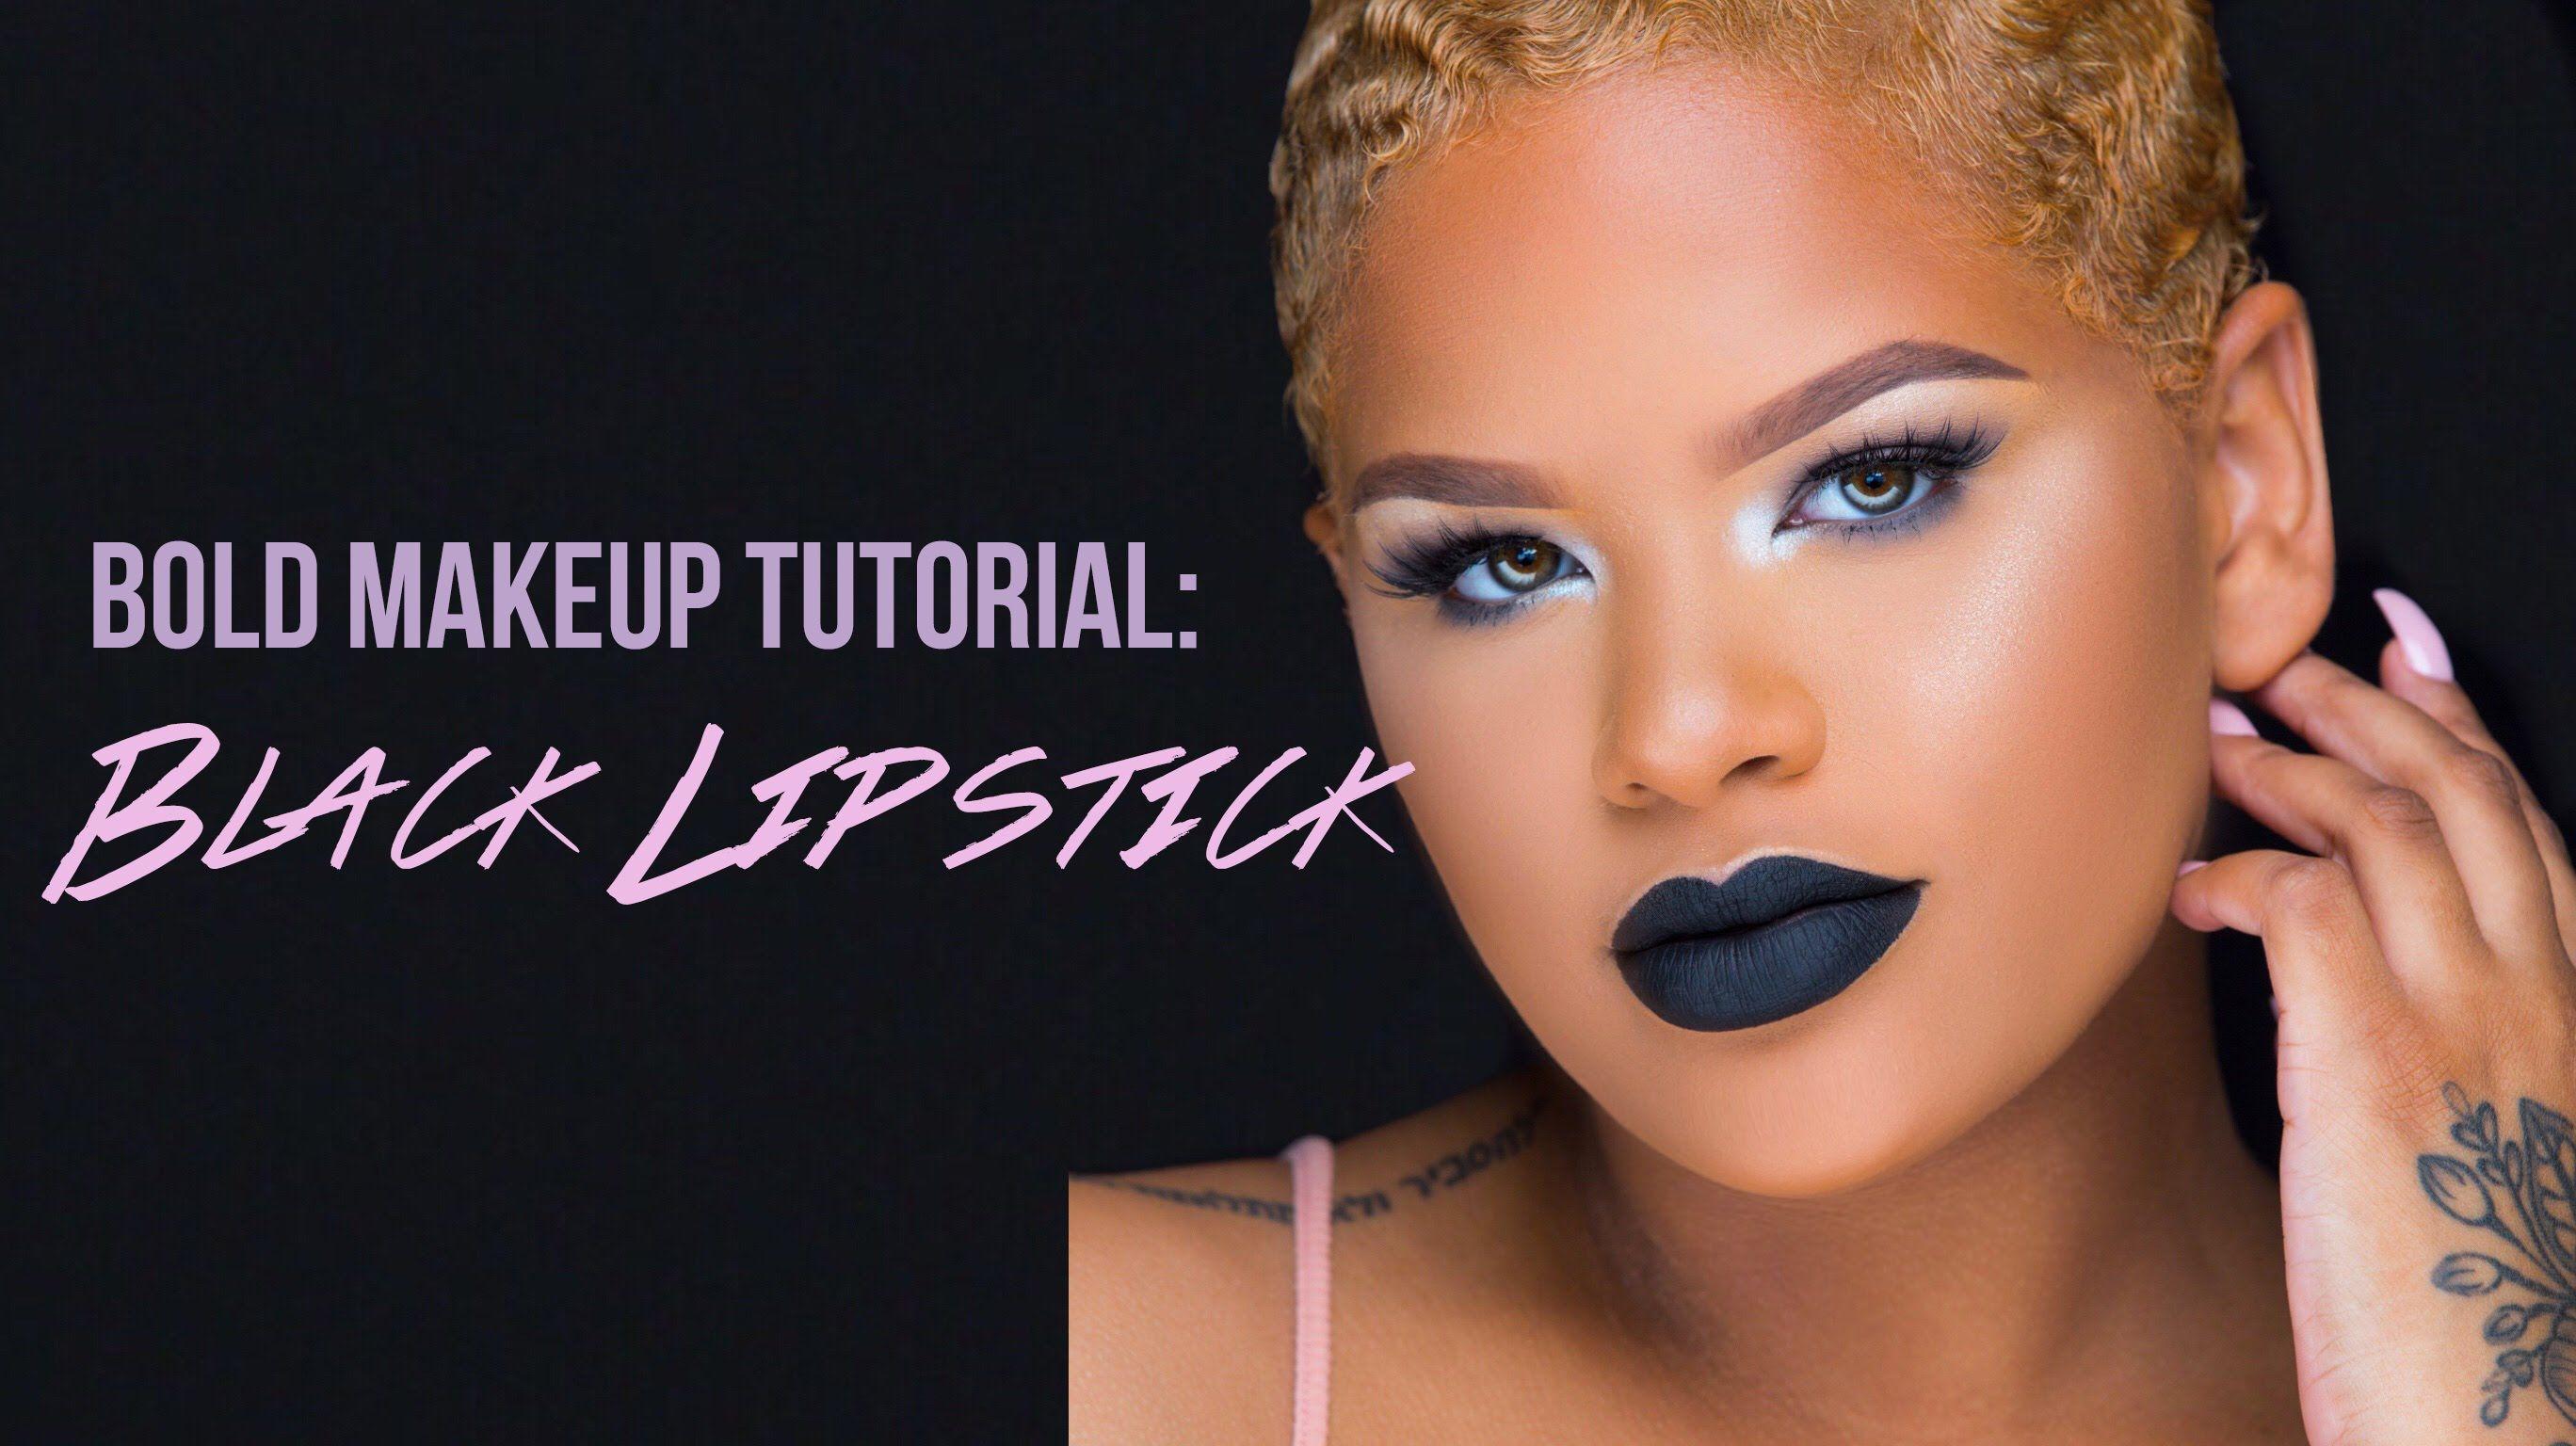 bold makeup tutorial: black lipstick collab w/ teaira walker